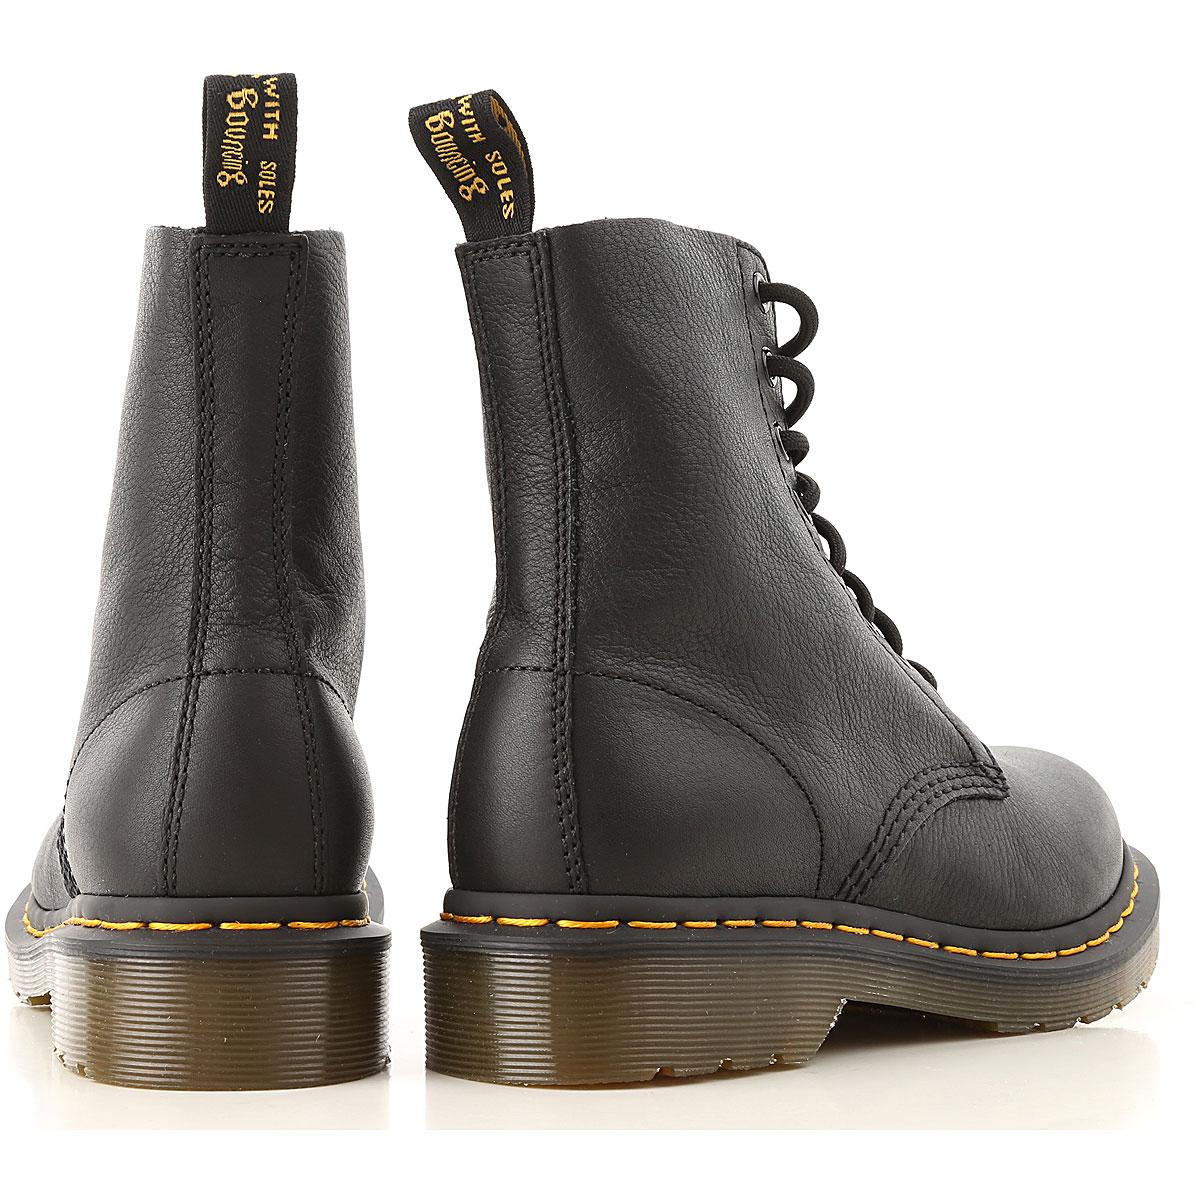 stile attraente tecnologia avanzata fashion style Womens Shoes Dr. Martens, Style code: 1460pascal-13512006-black